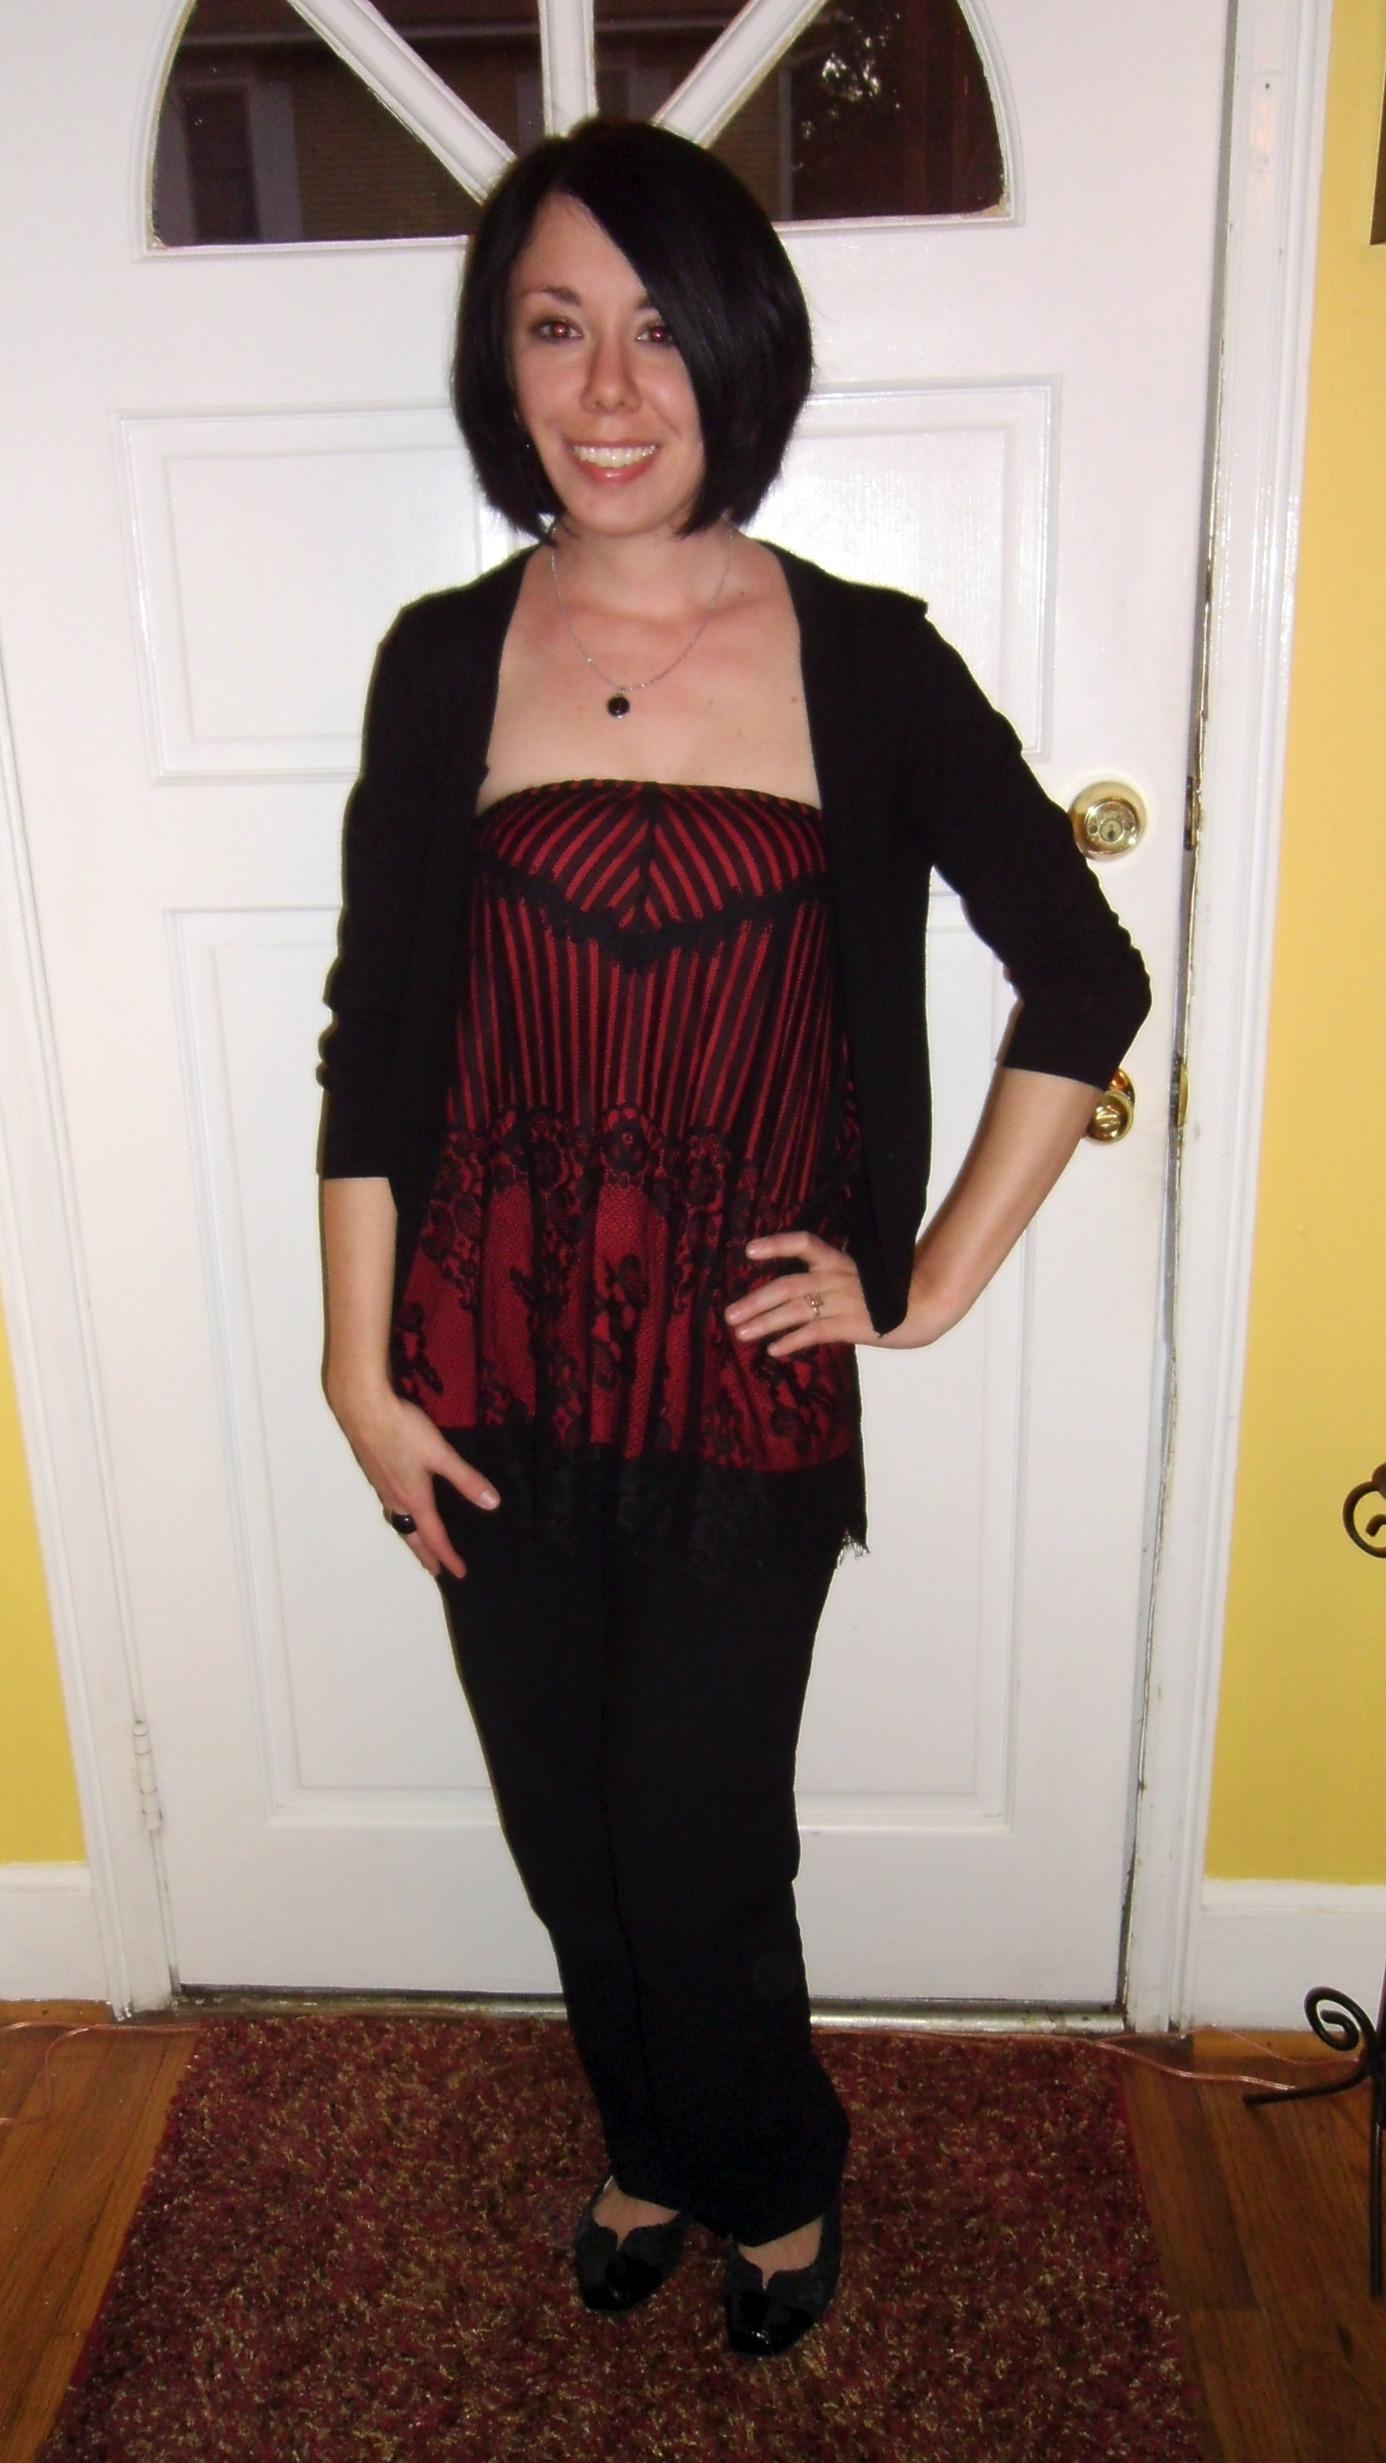 Day 125: Skirt or Shirt? 3